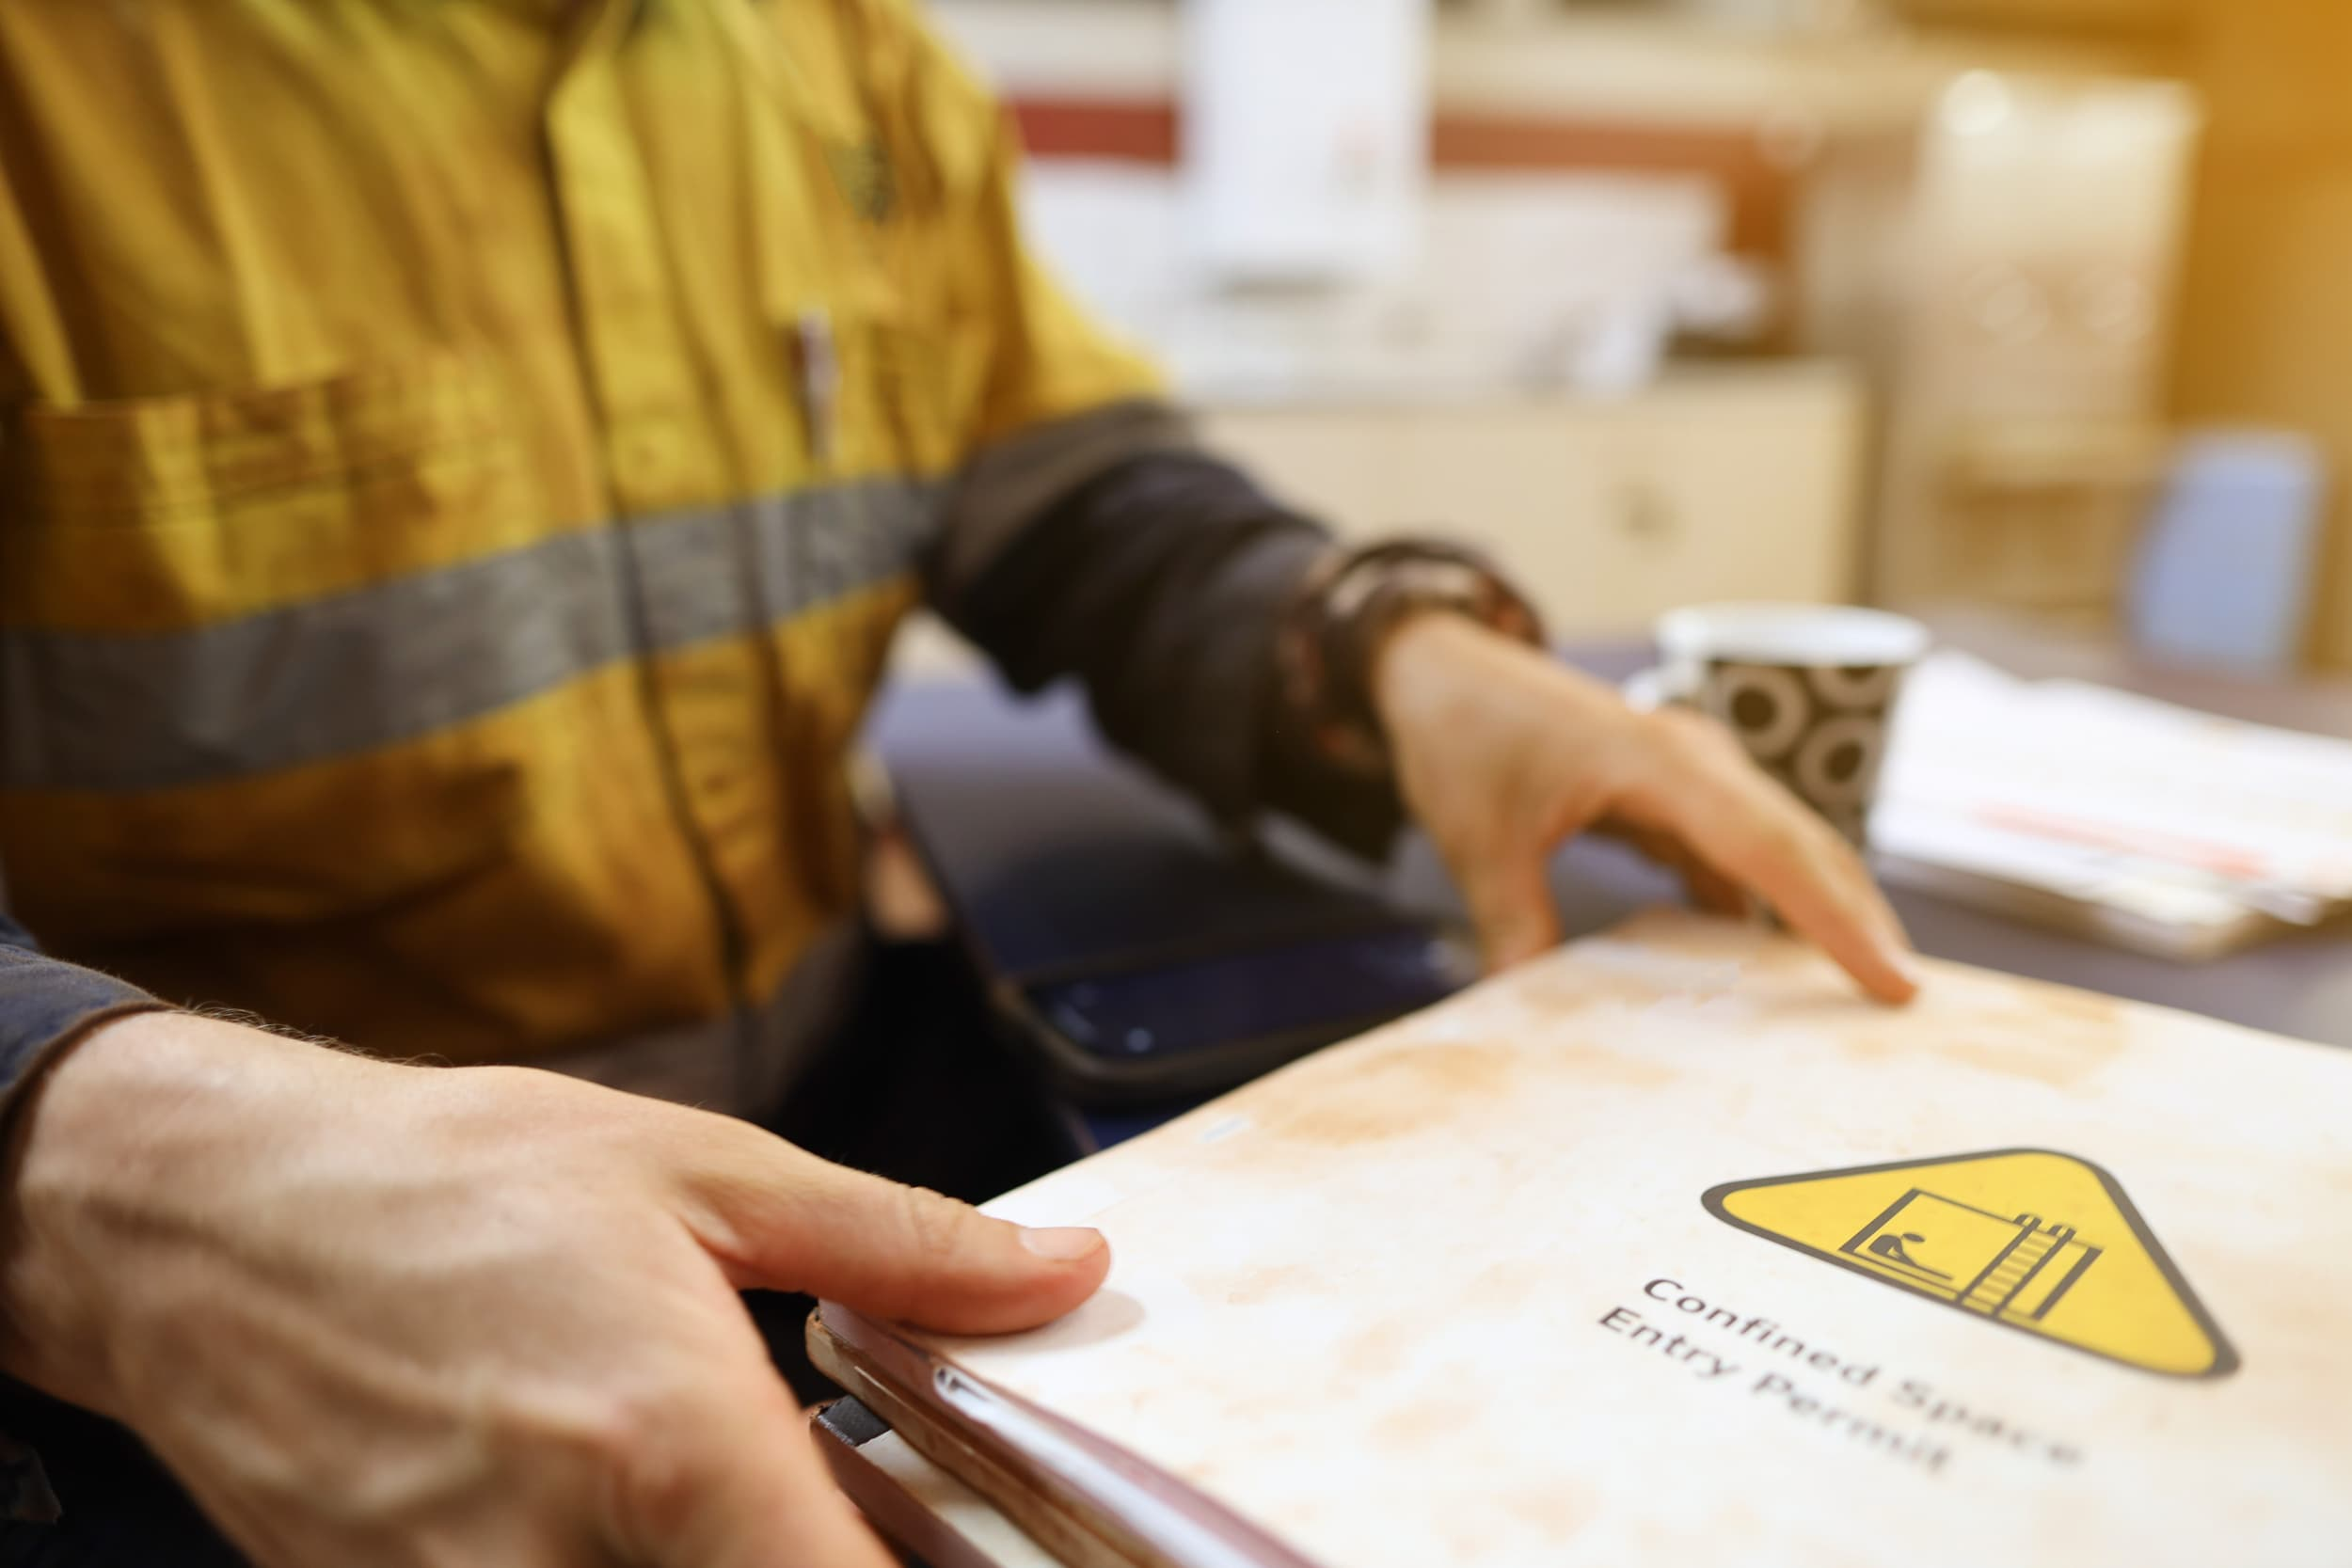 Compliance Training Online Construction Confined Spaces Competent Person/Supervisor course